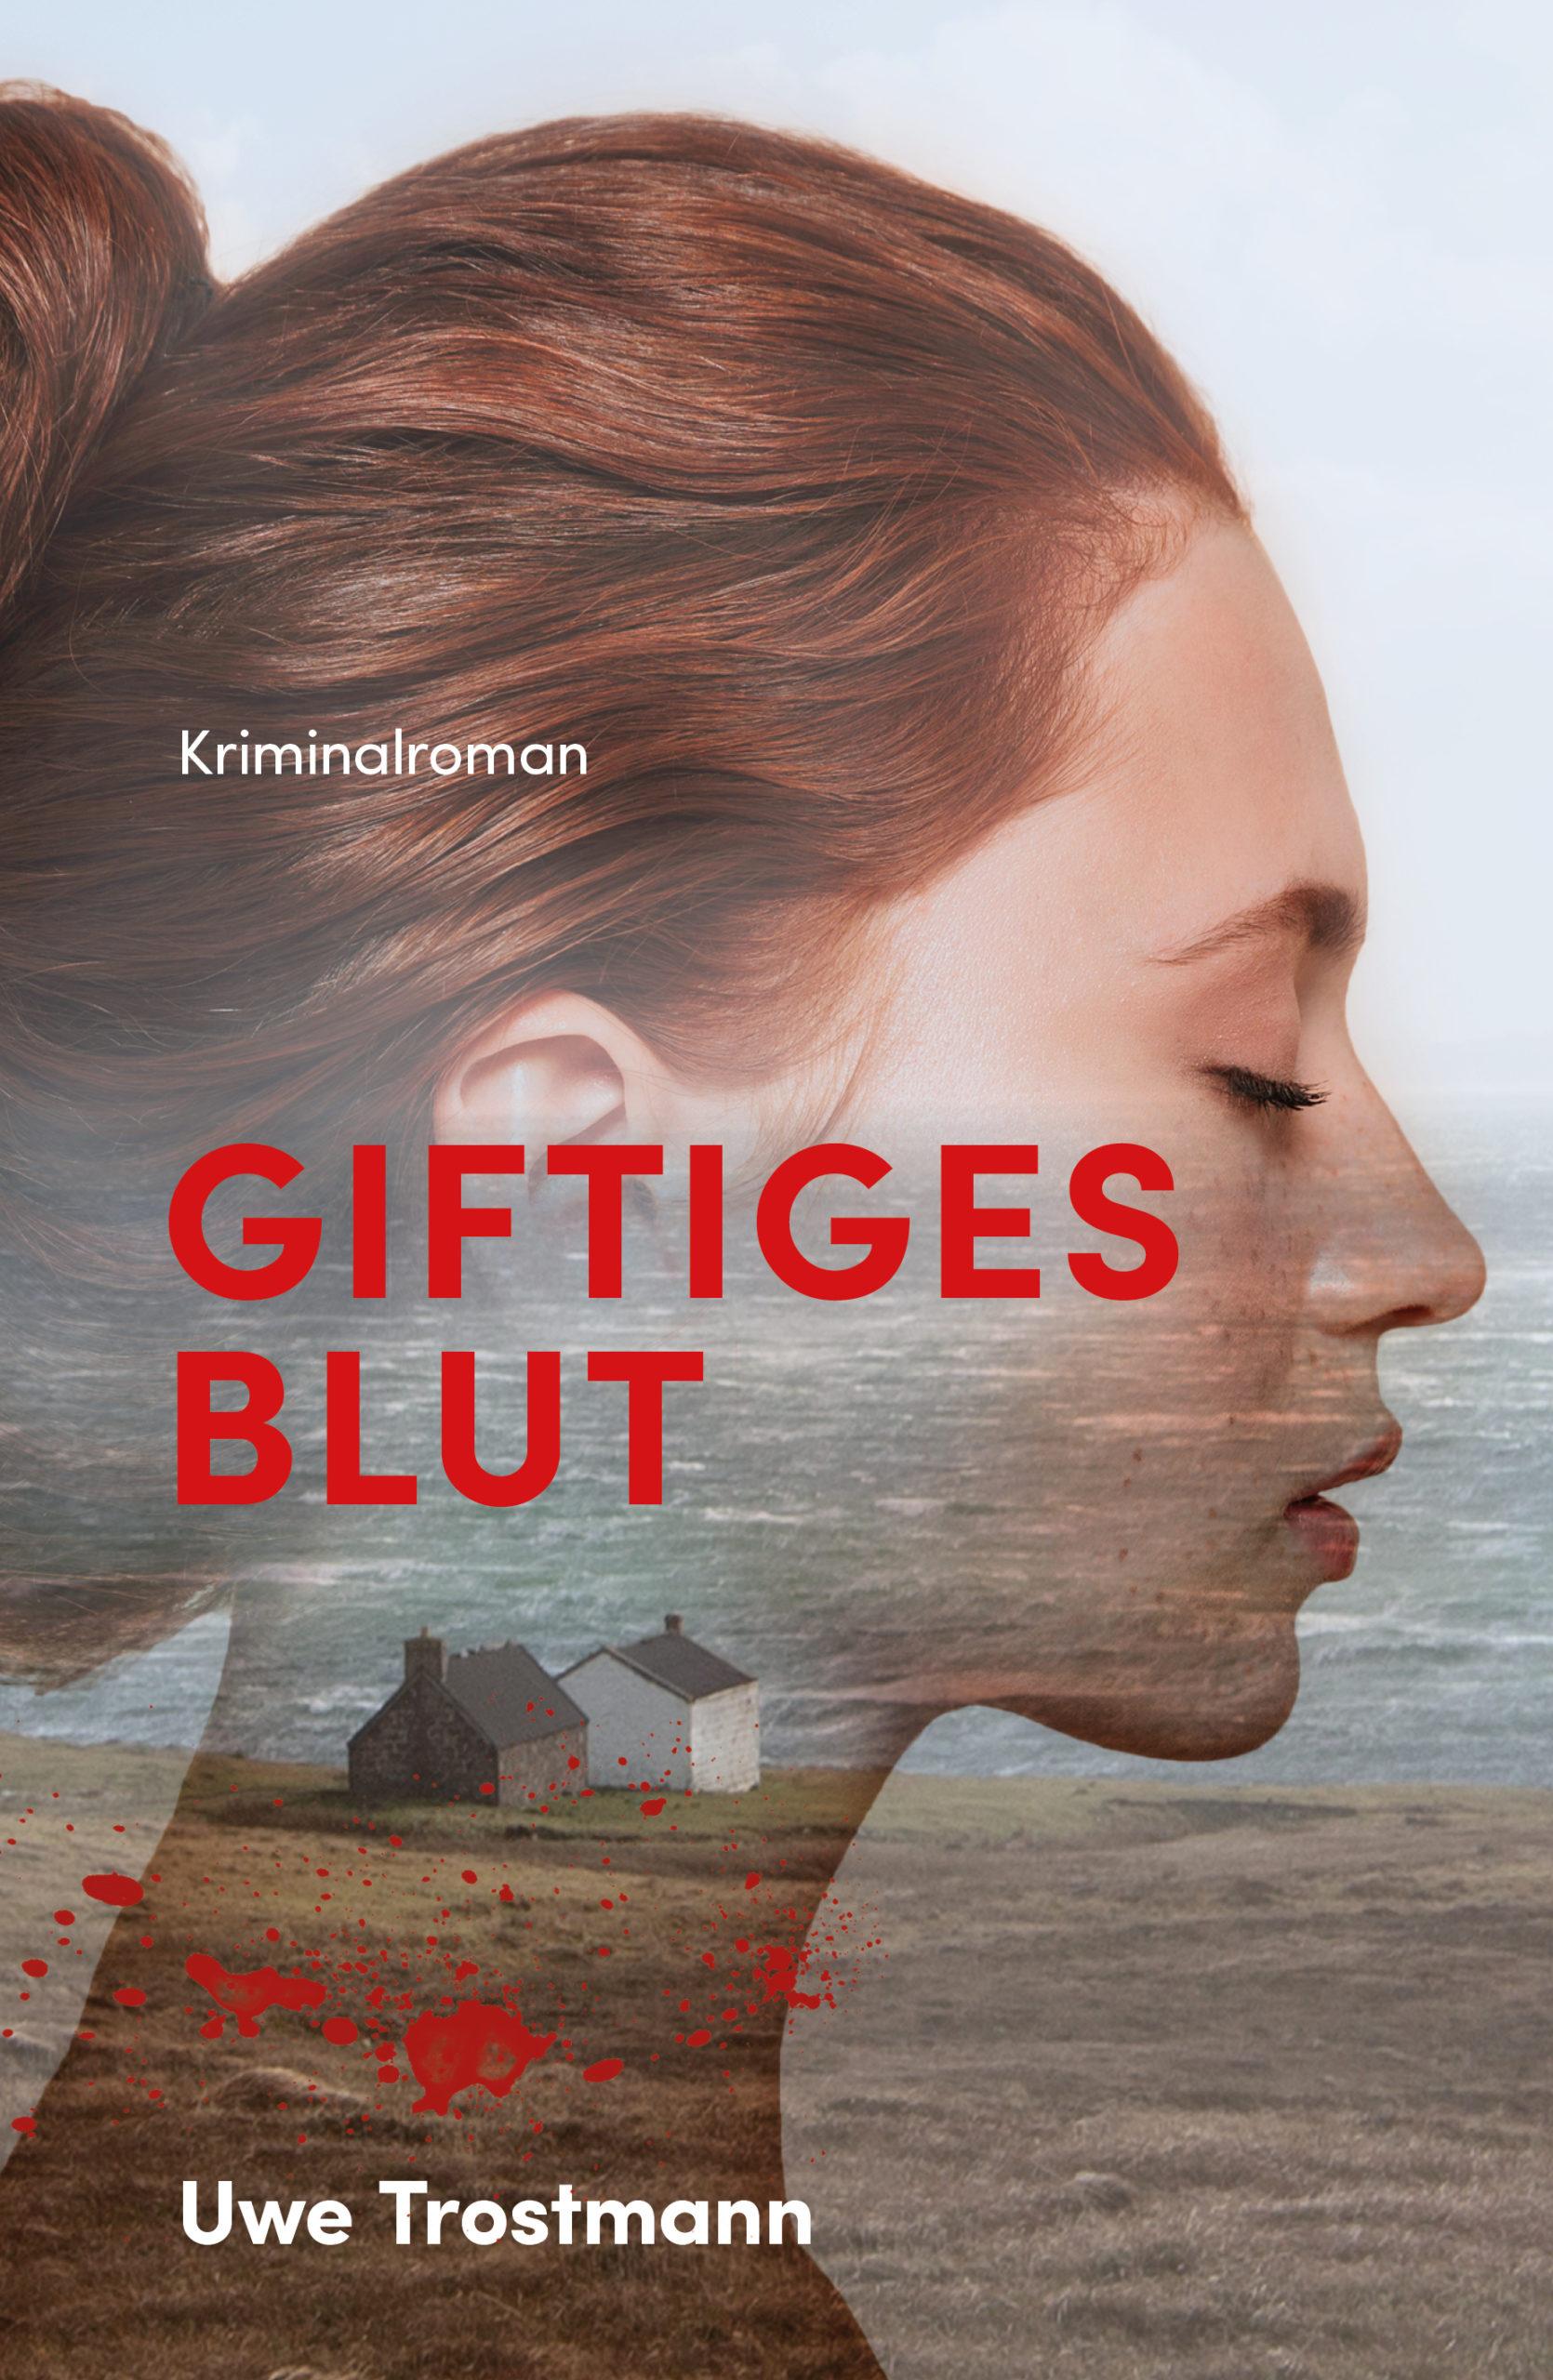 Buchcover_GiftigesBlut_1849x2835px_e-book_RZ